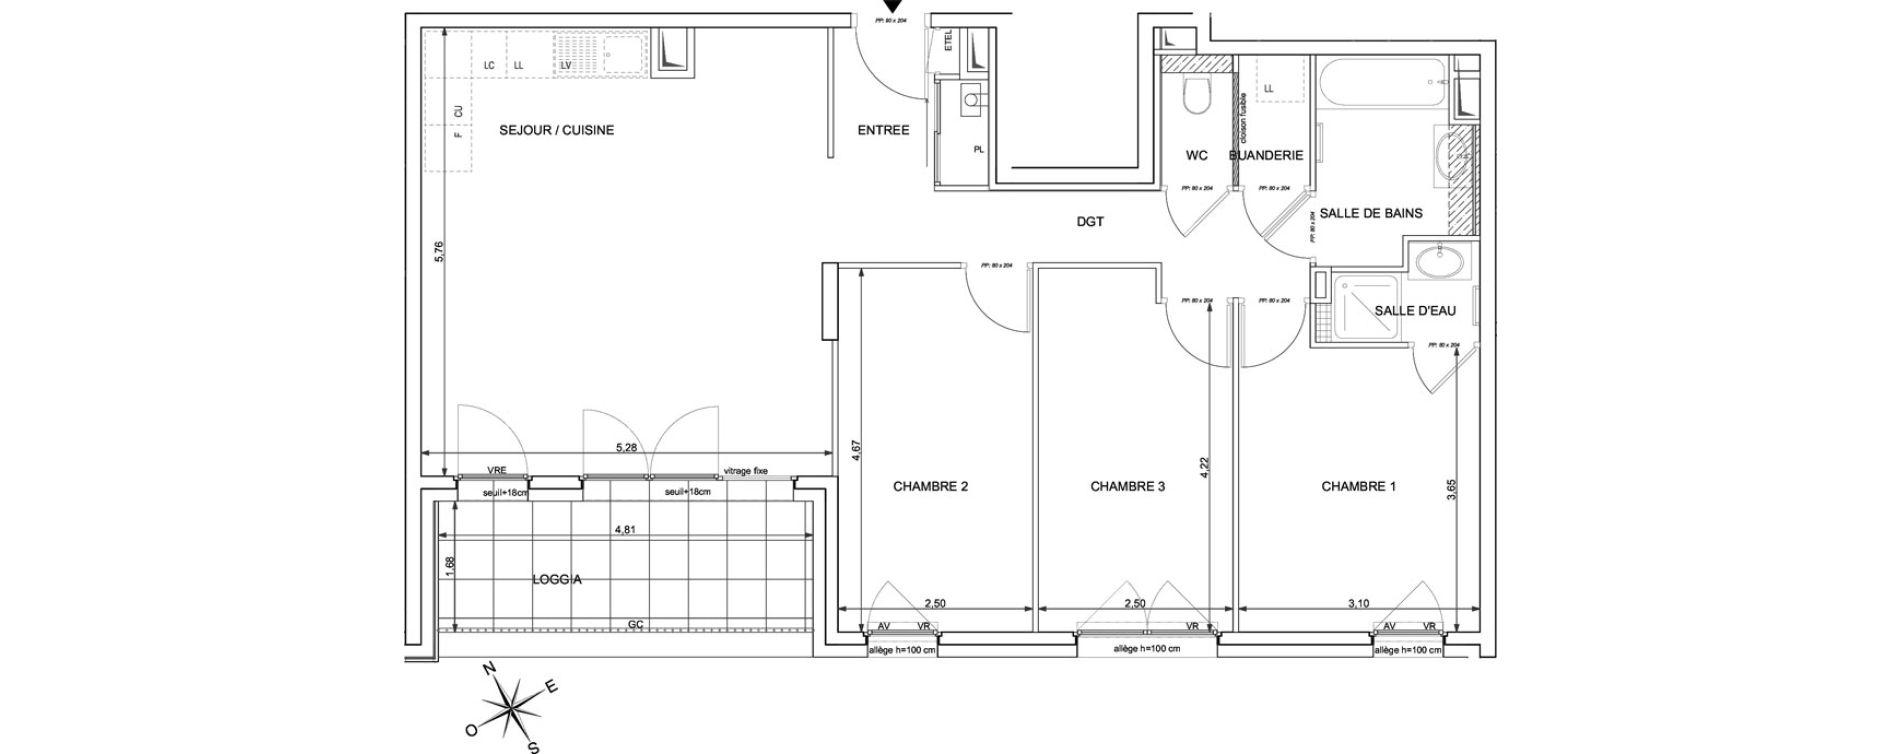 Appartement T4 de 84,66 m2 à Marigny-Saint-Marcel Marigny st marcel